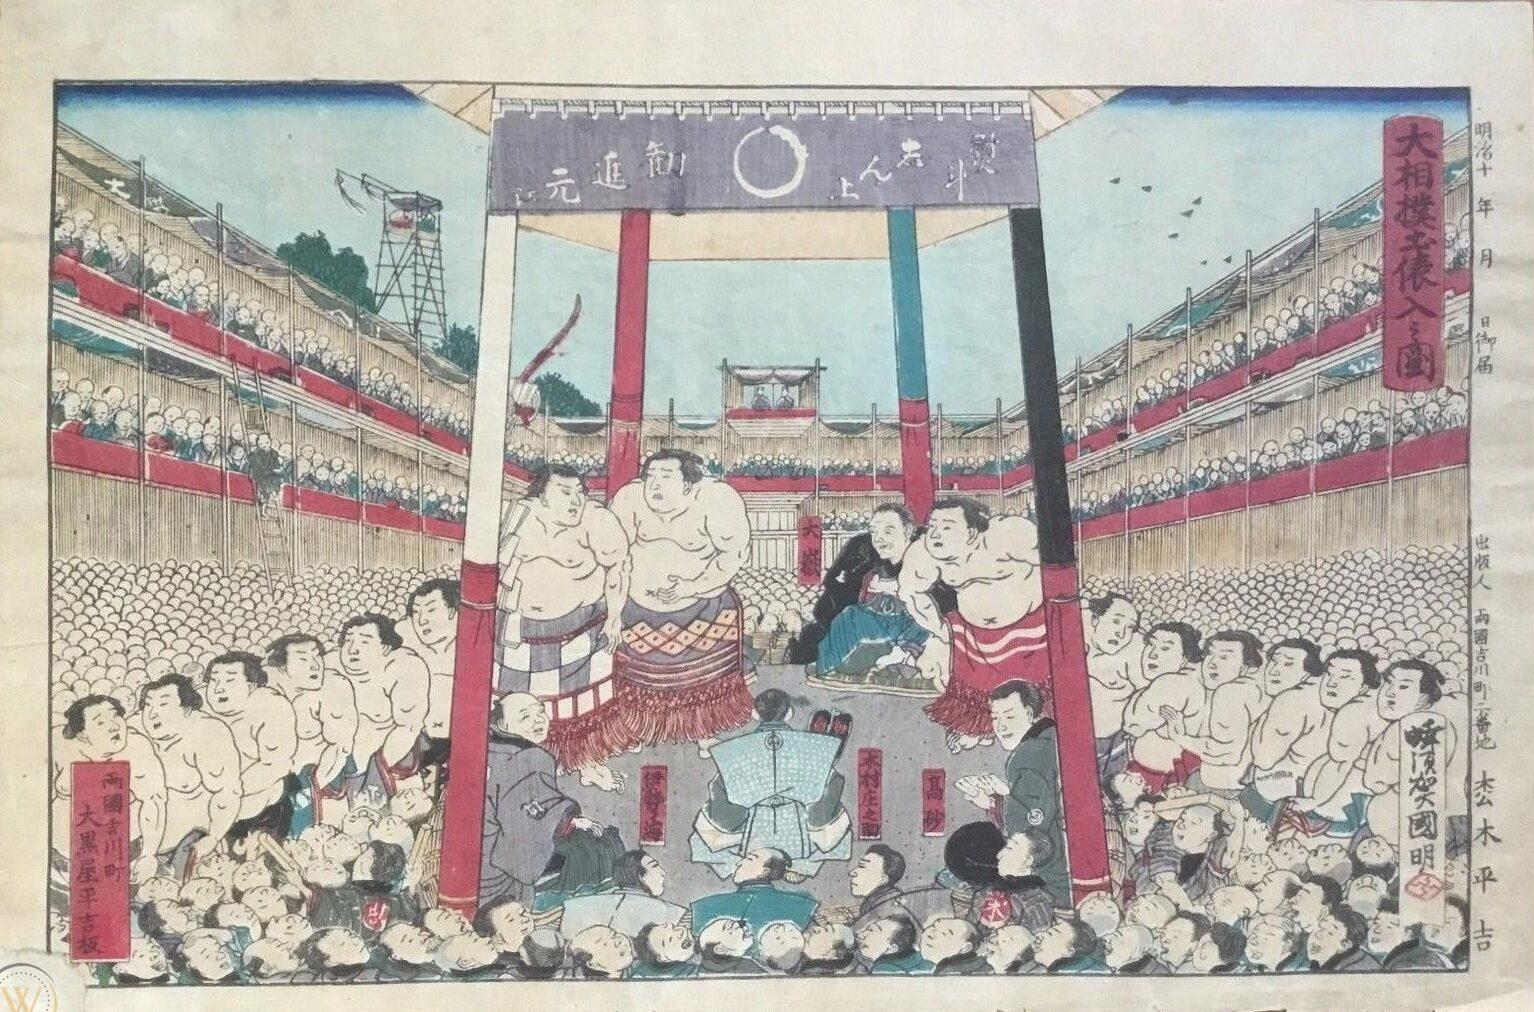 antiguo combate de sumo